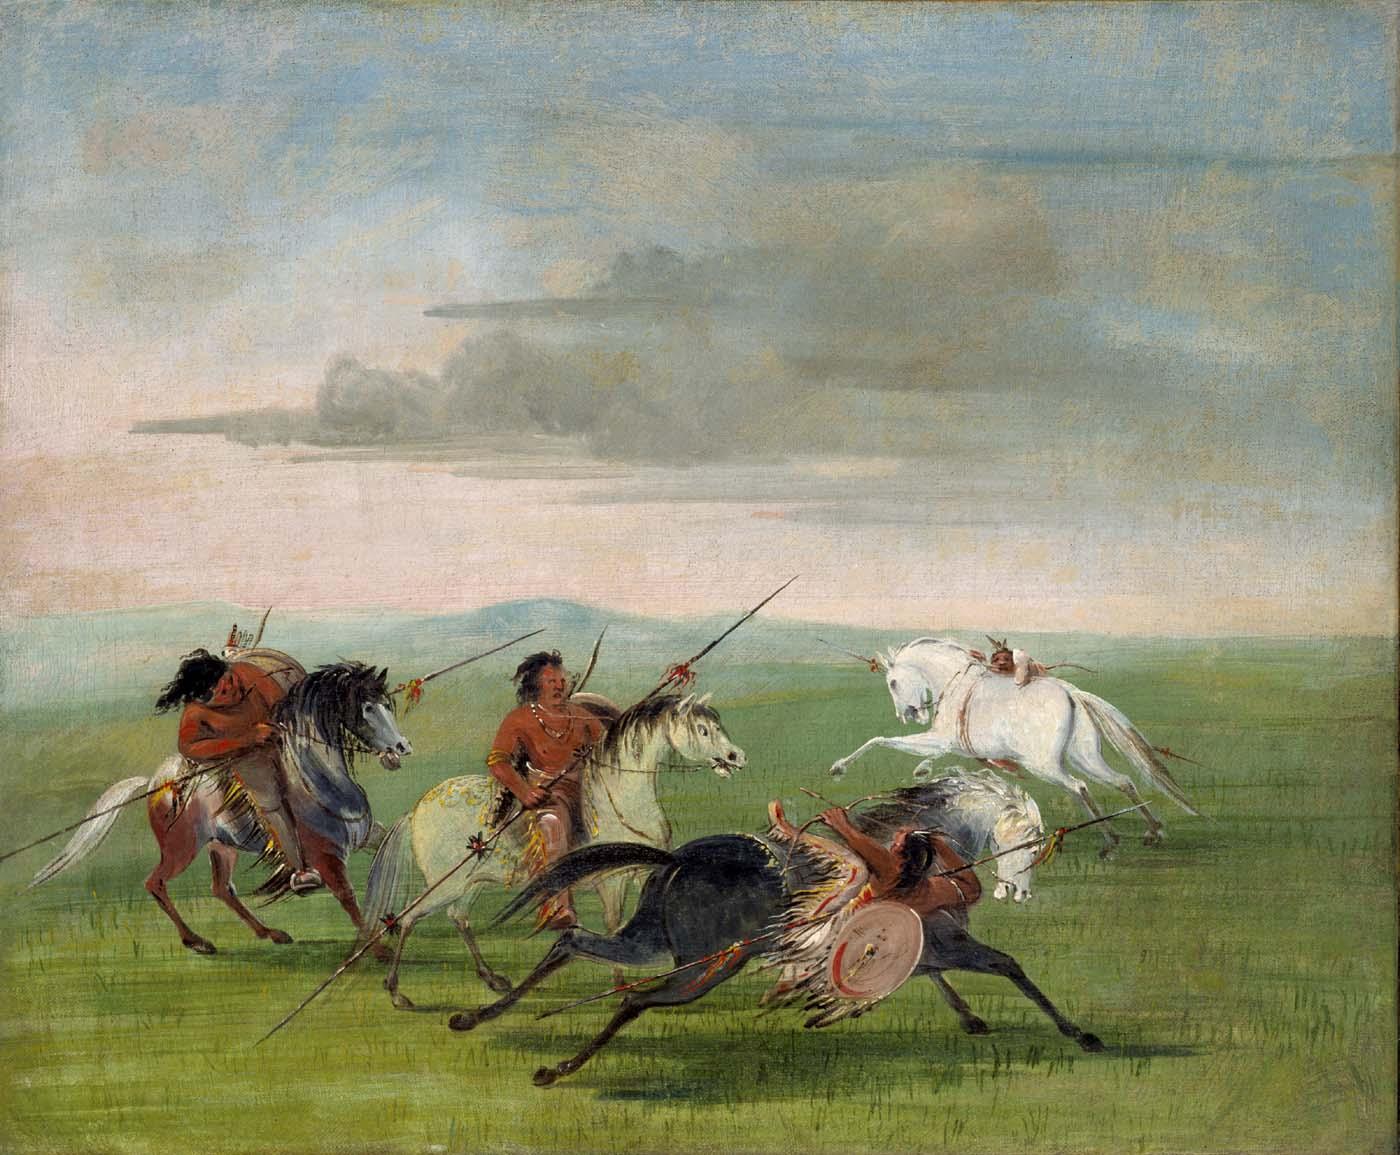 Comanche_Feats_of_Horsemanship-George_Catlin